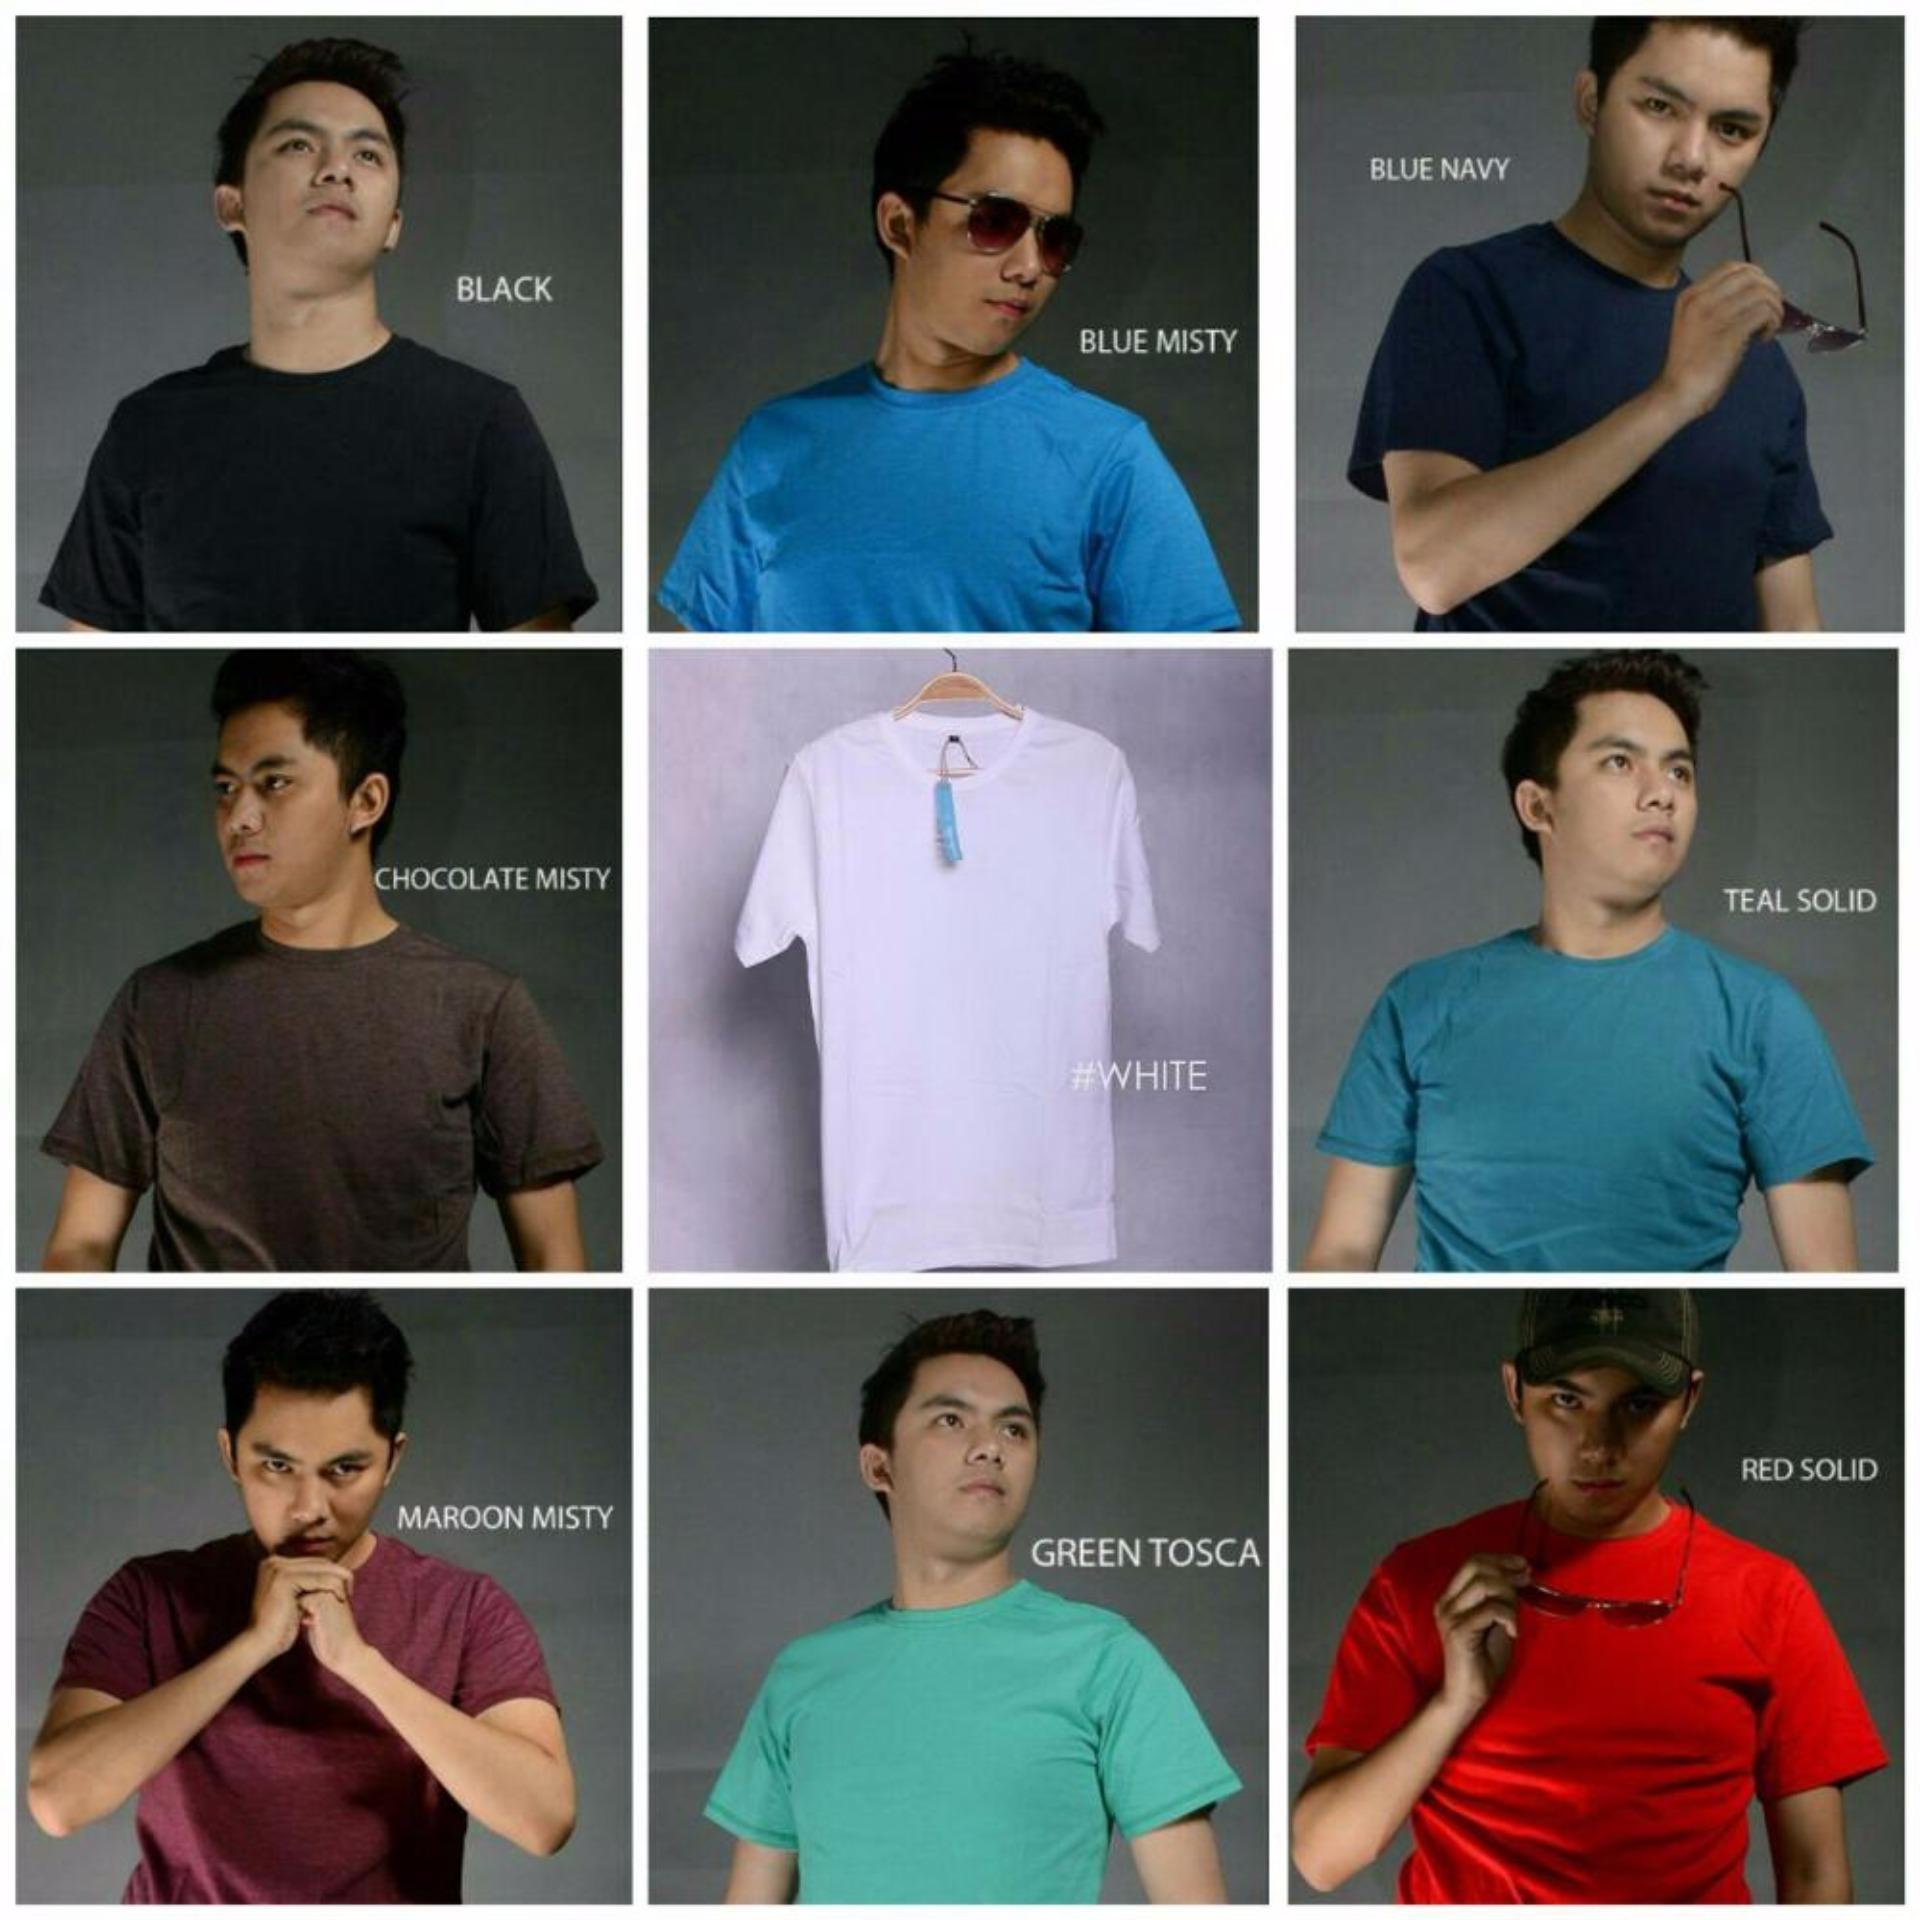 Flash Sale Kaos Polos Combed 30s Import Harga Penawaran Teal Solid